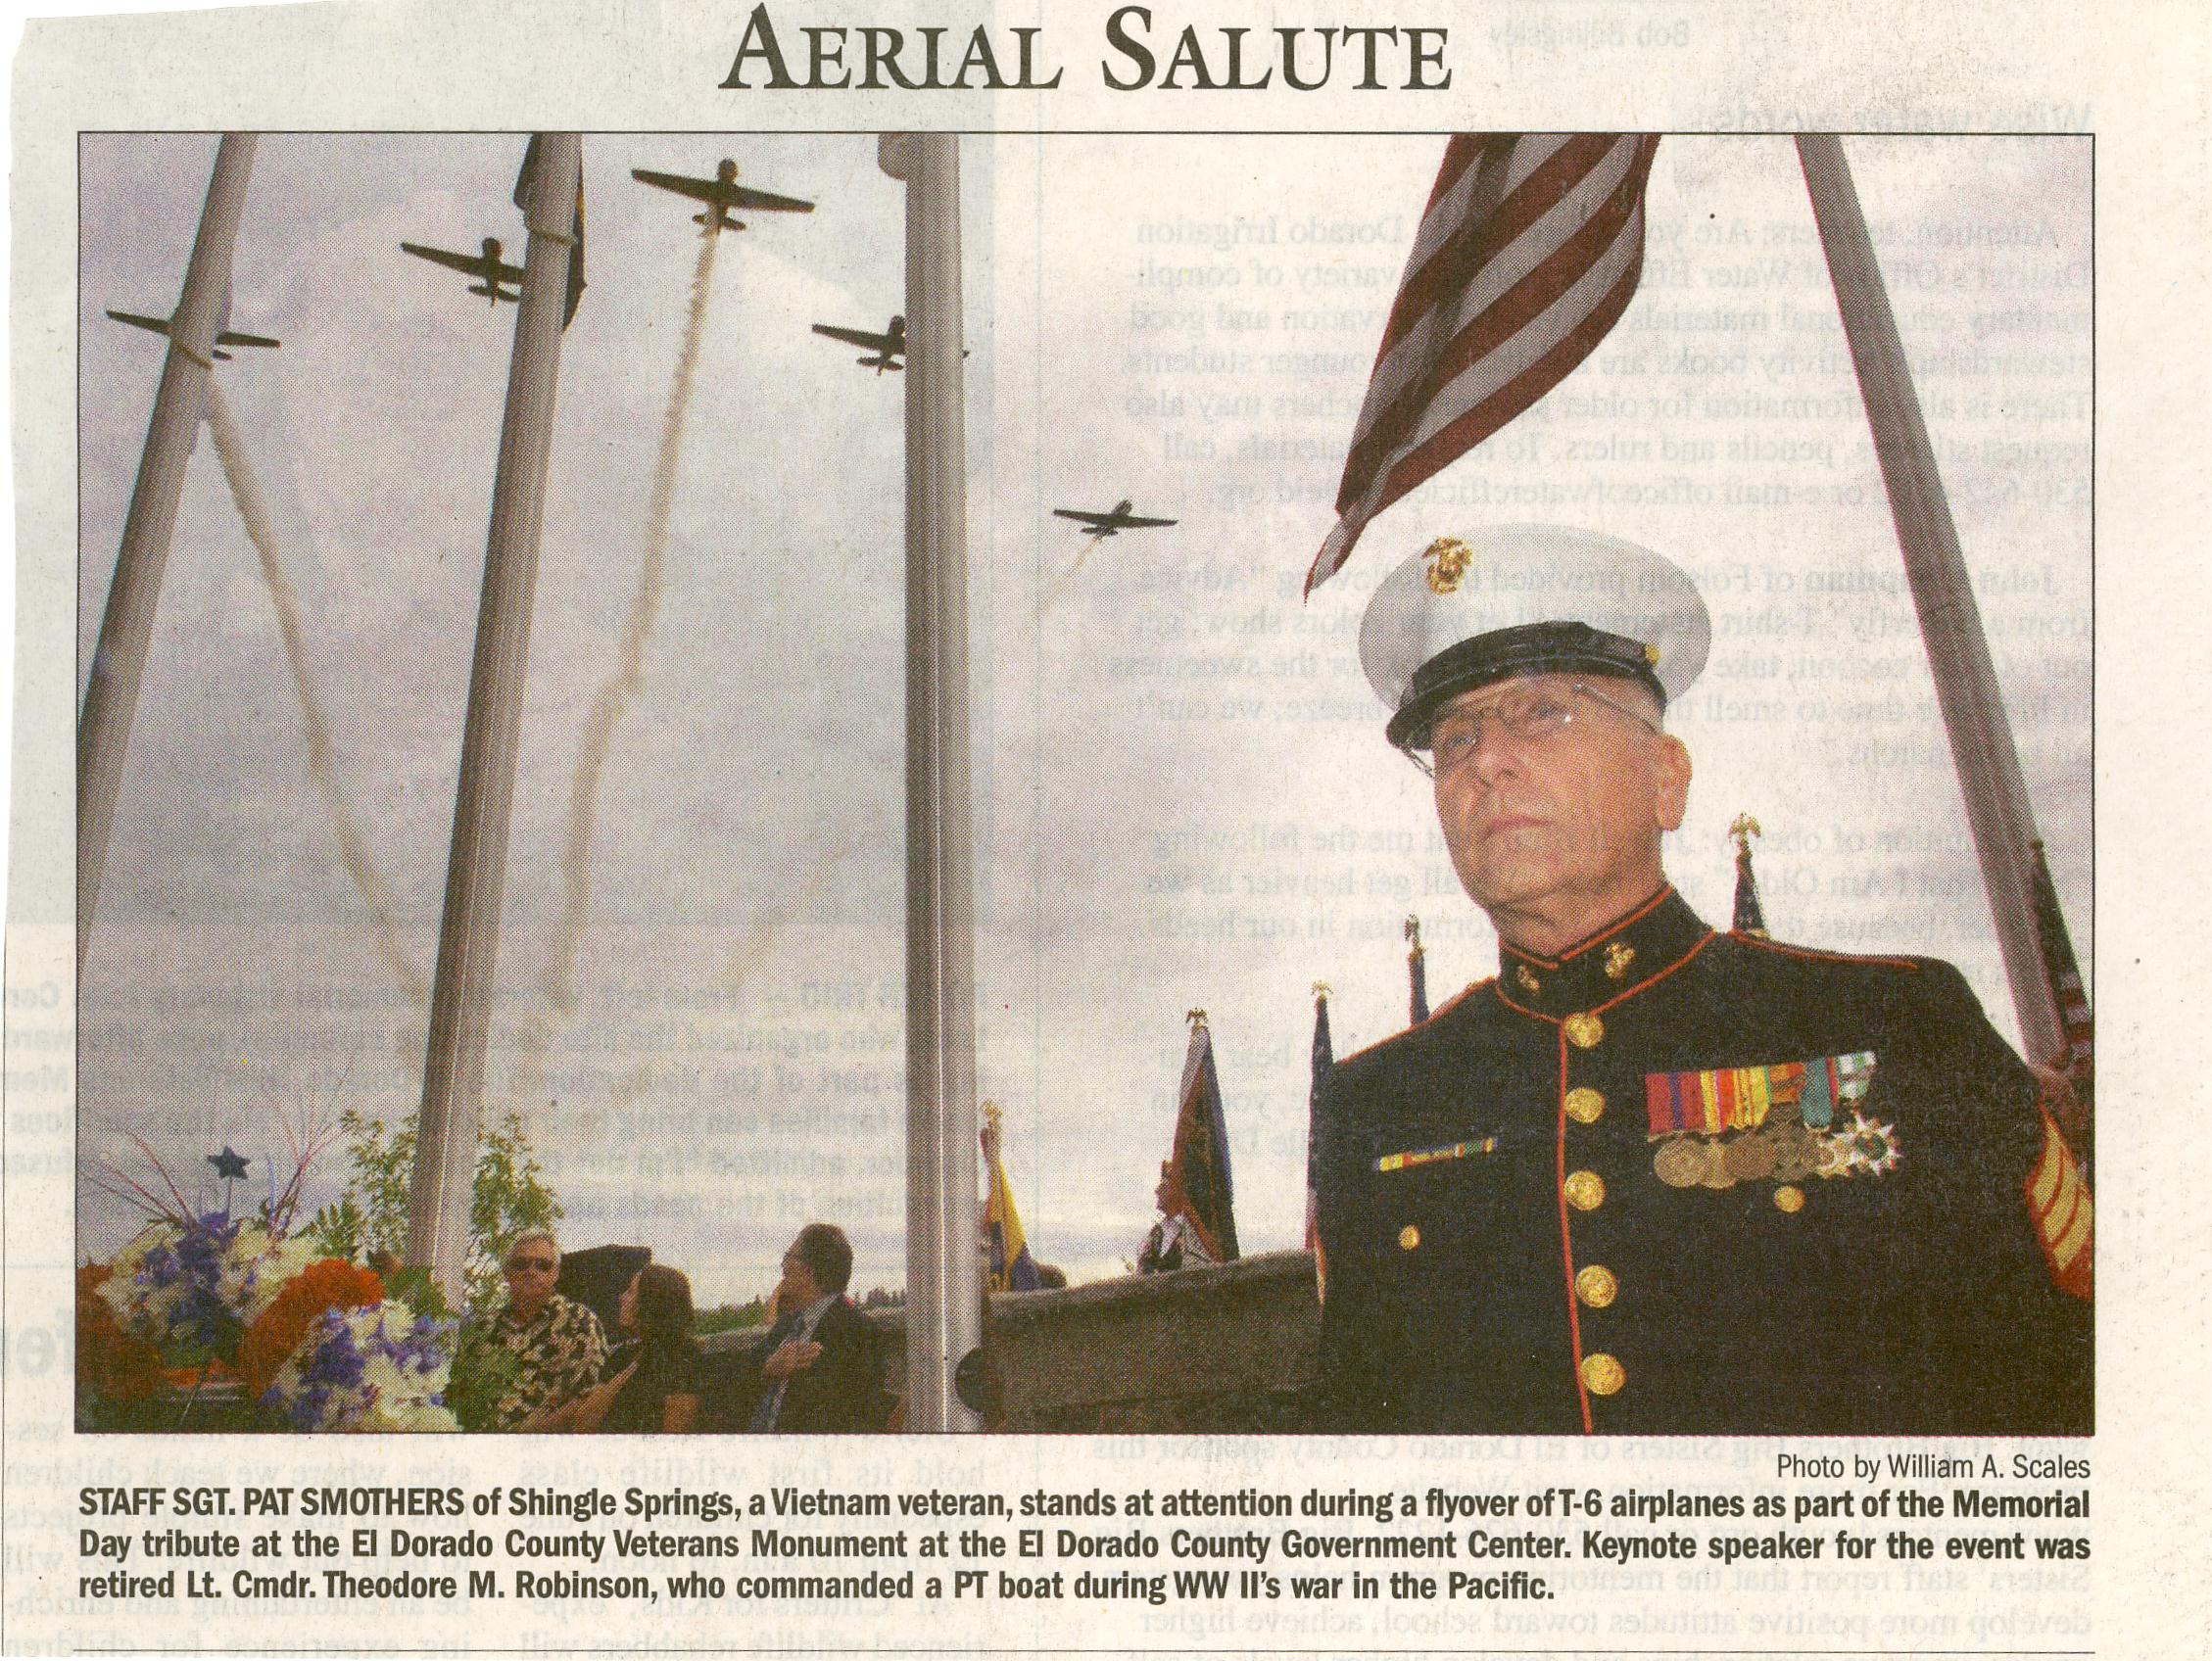 Sgt. Pat Smothers, USMC